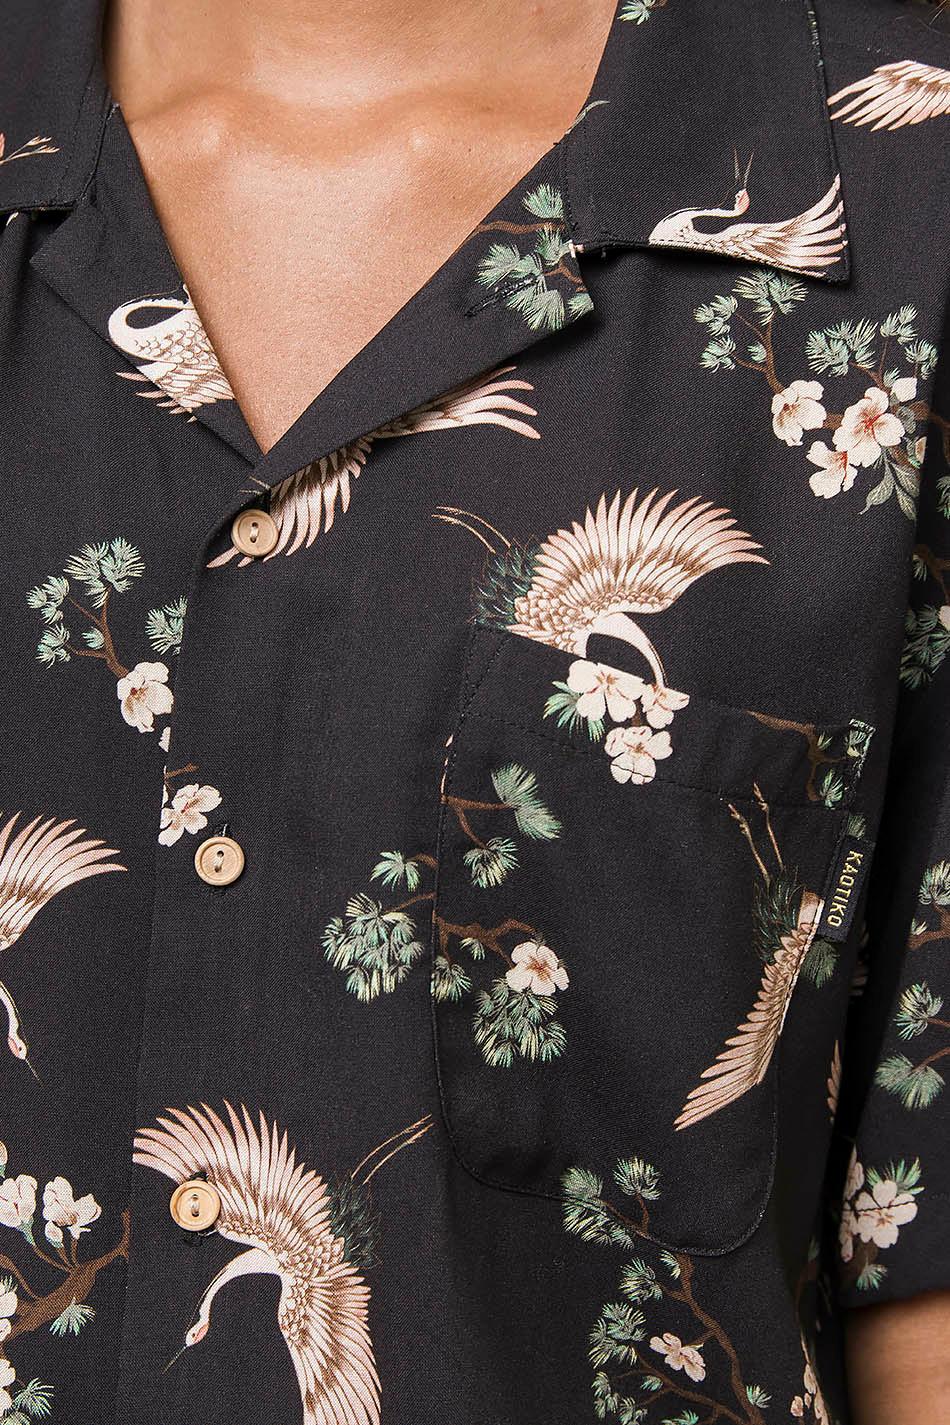 Kyoto Schwarzes T-Shirt